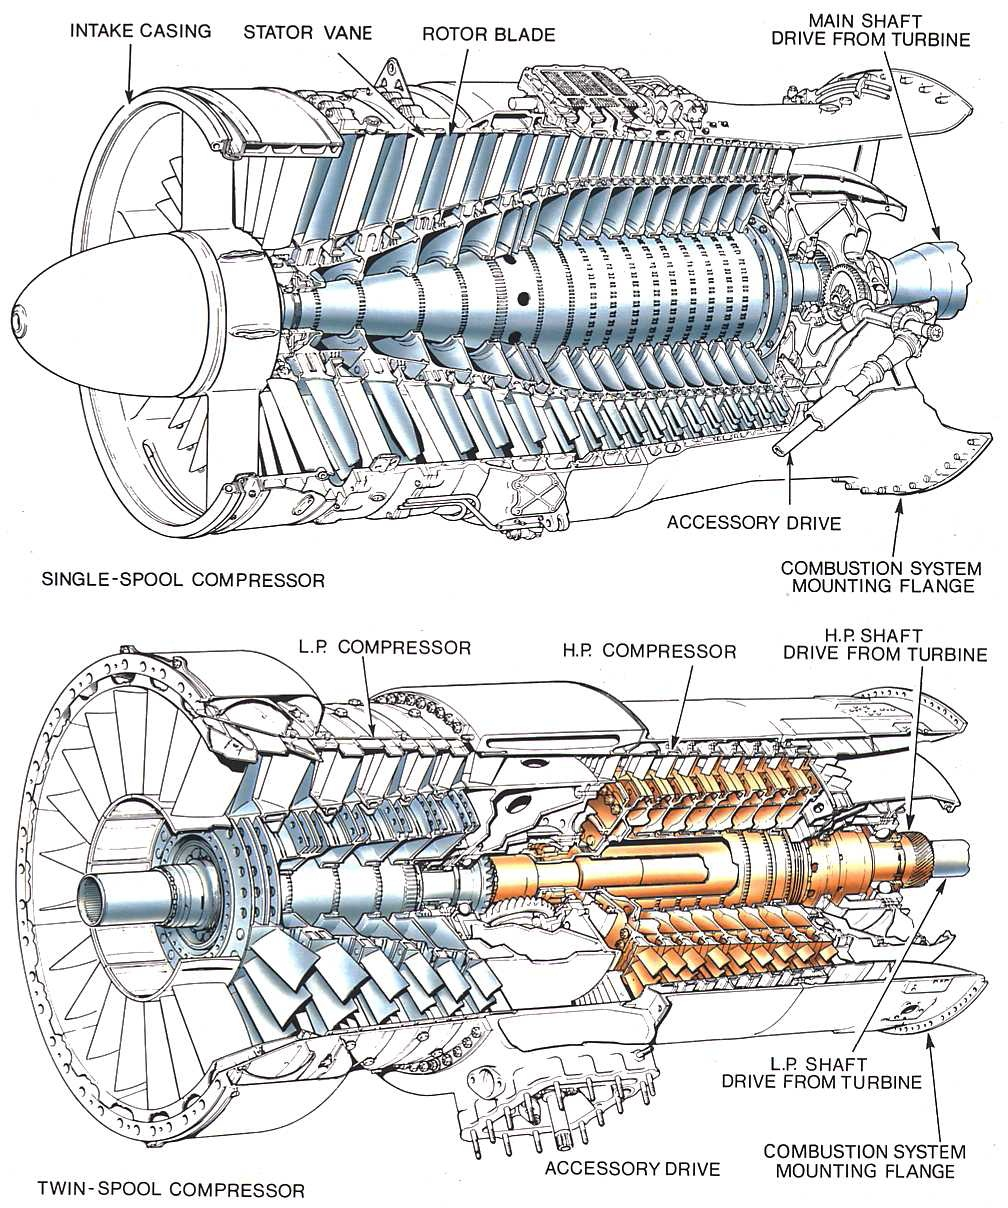 medium resolution of model aircraft the axial flow compressor intake turboshaft helicopter engine diagram turbine engine stator vanes